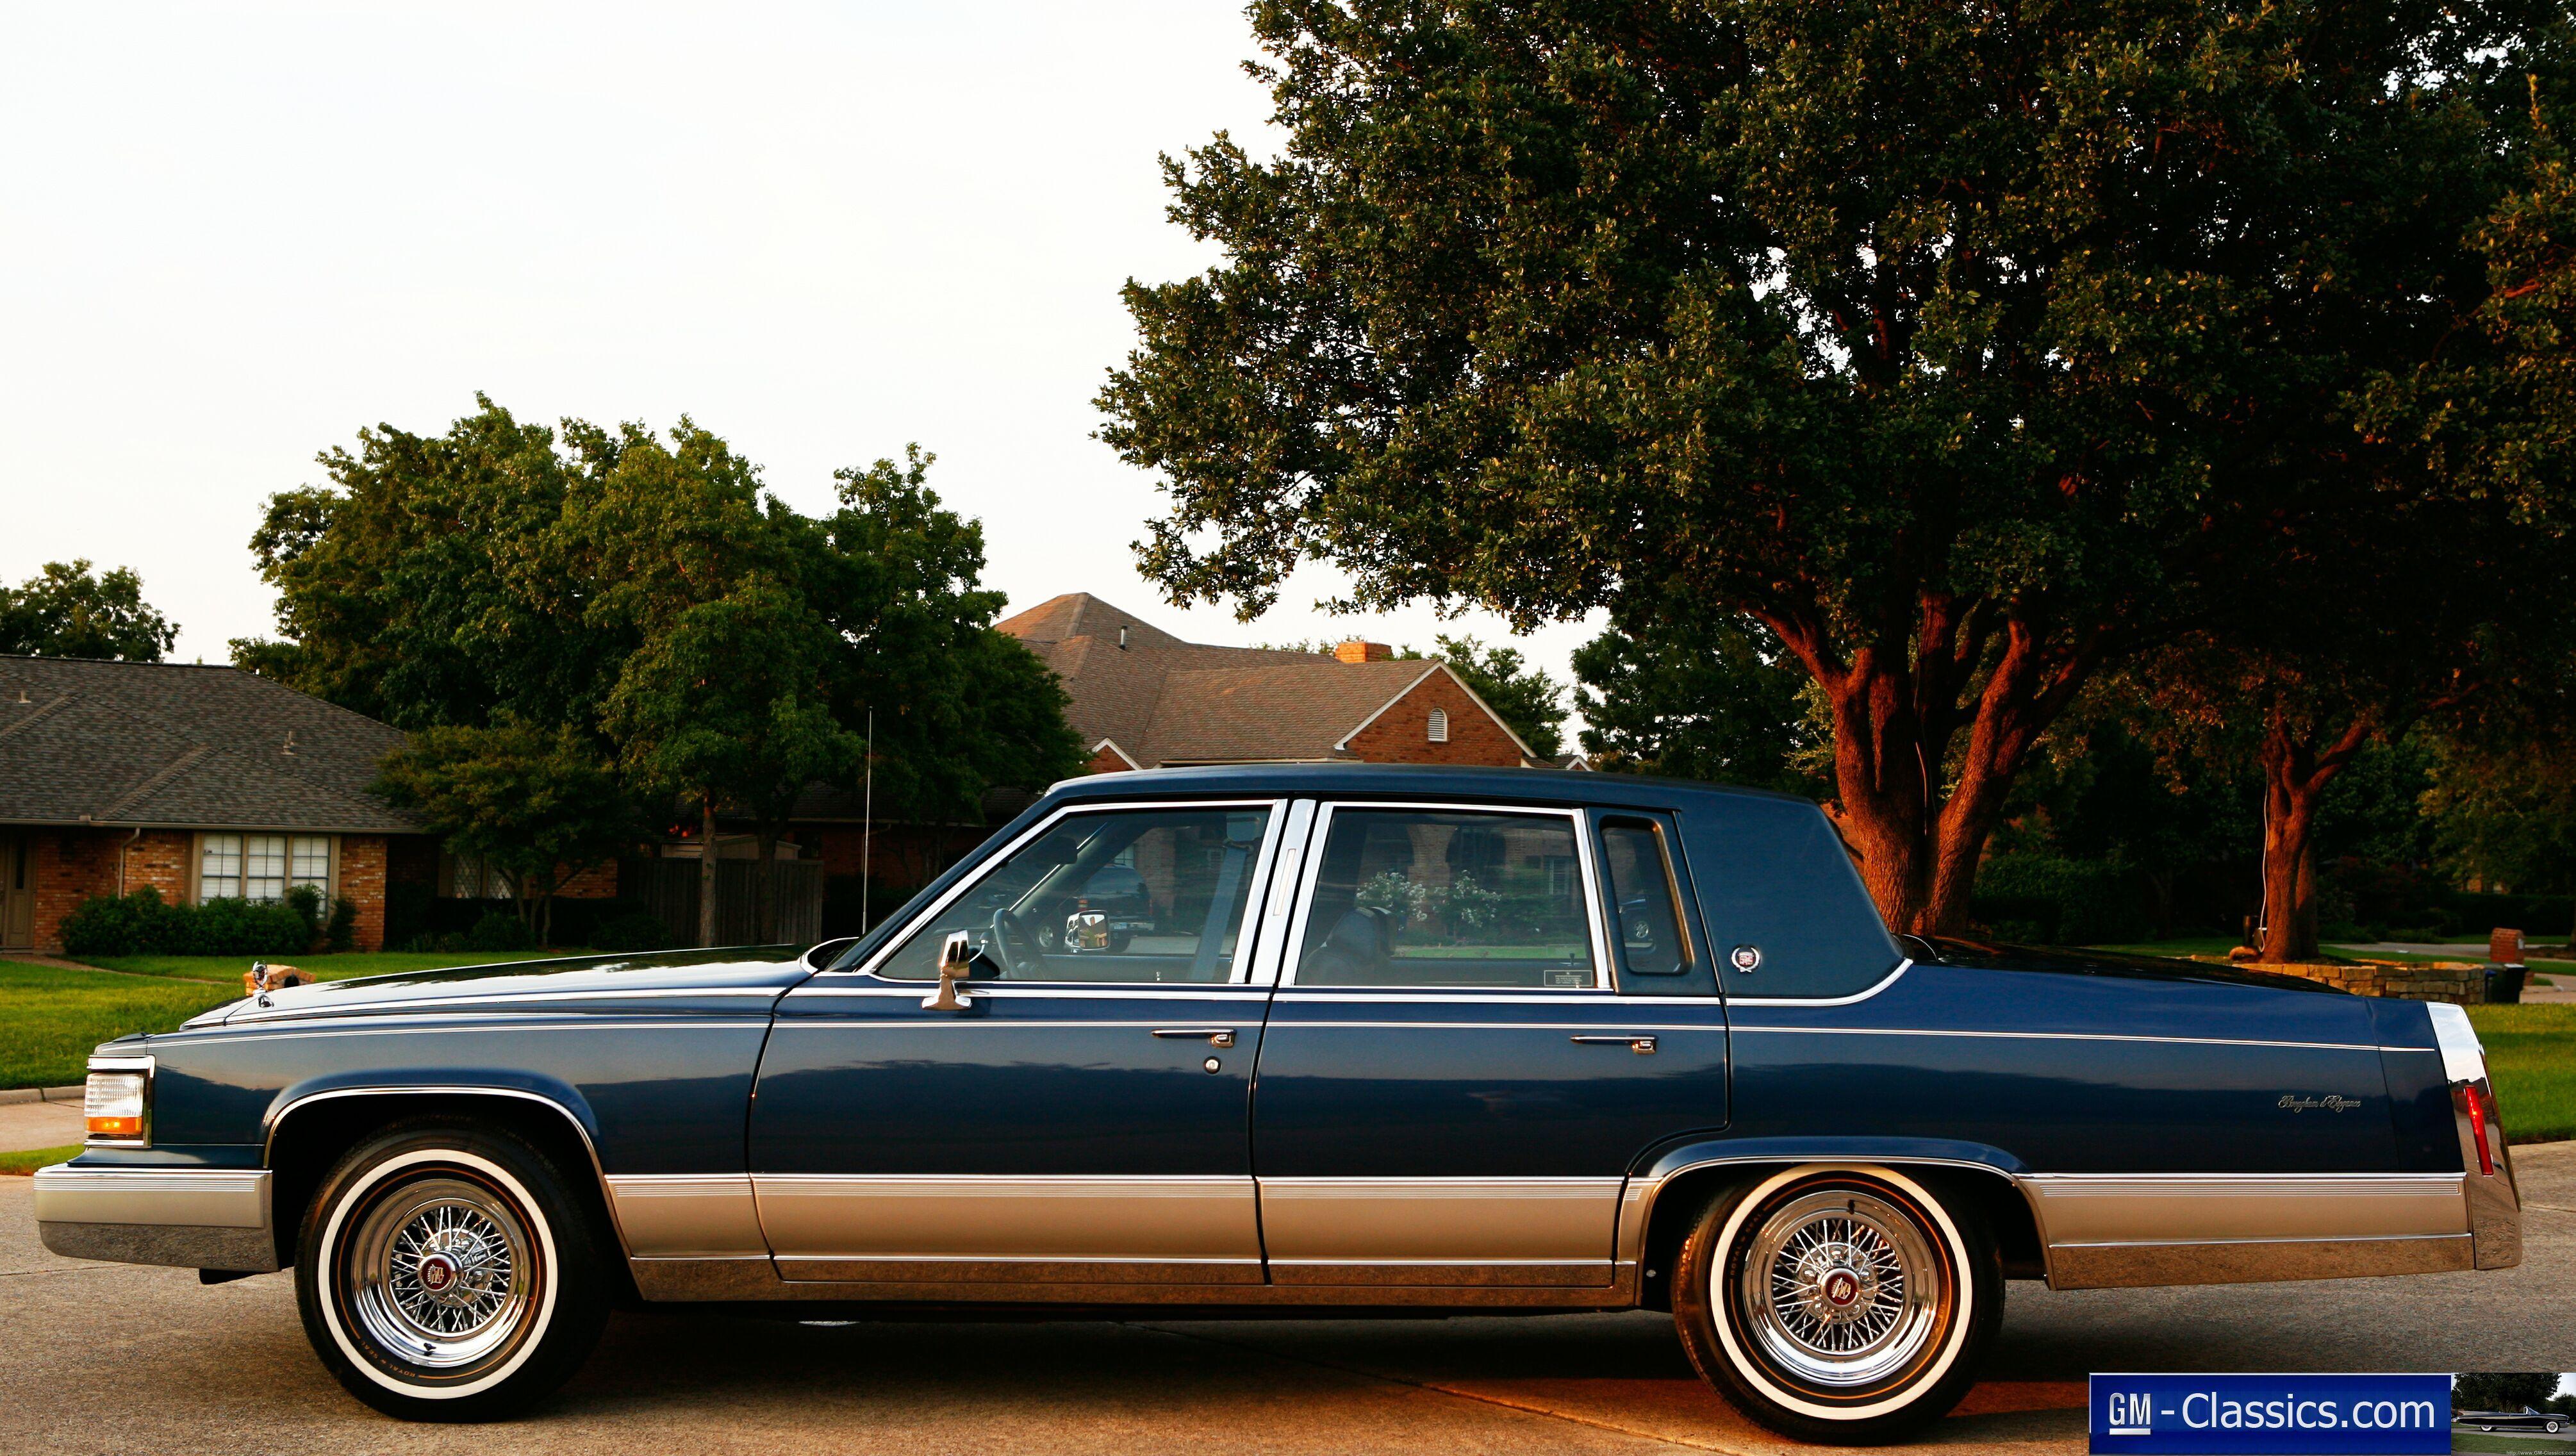 1992 cadillac sedan deville cadillac 1991 2005 pinterest cadillac sedans and cars